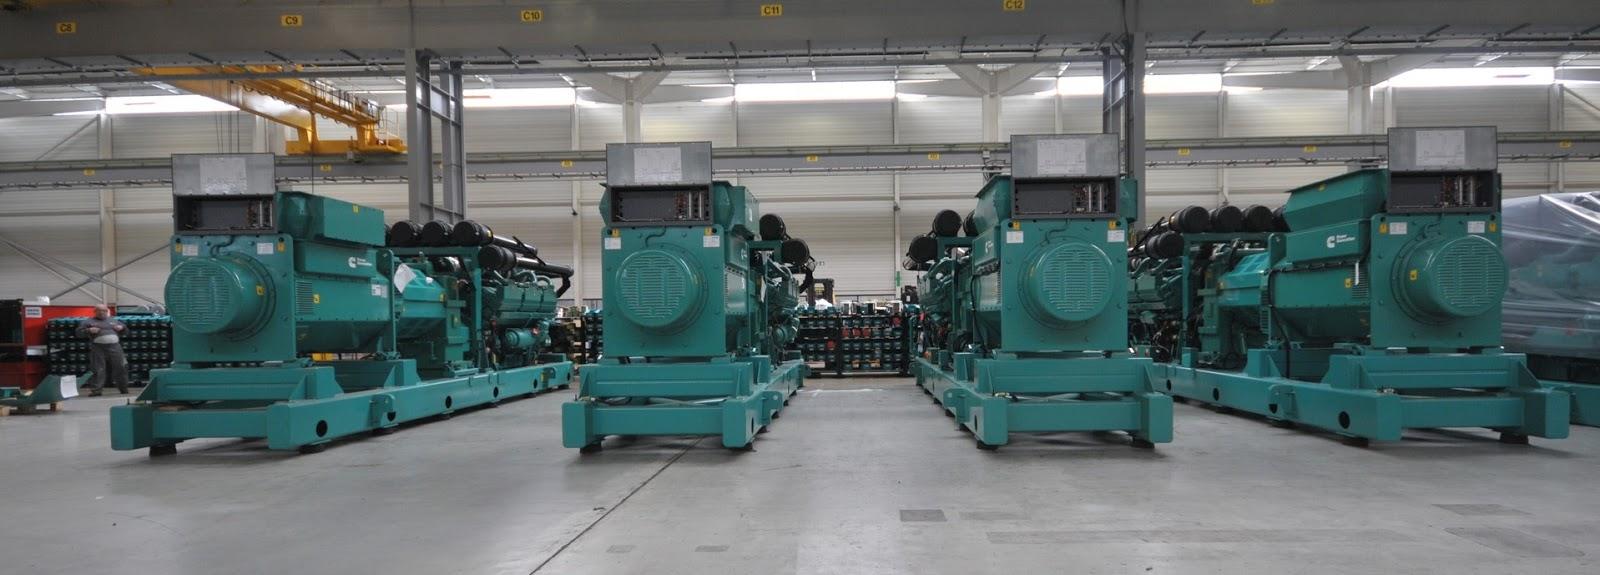 Generators for Continuous Production 3